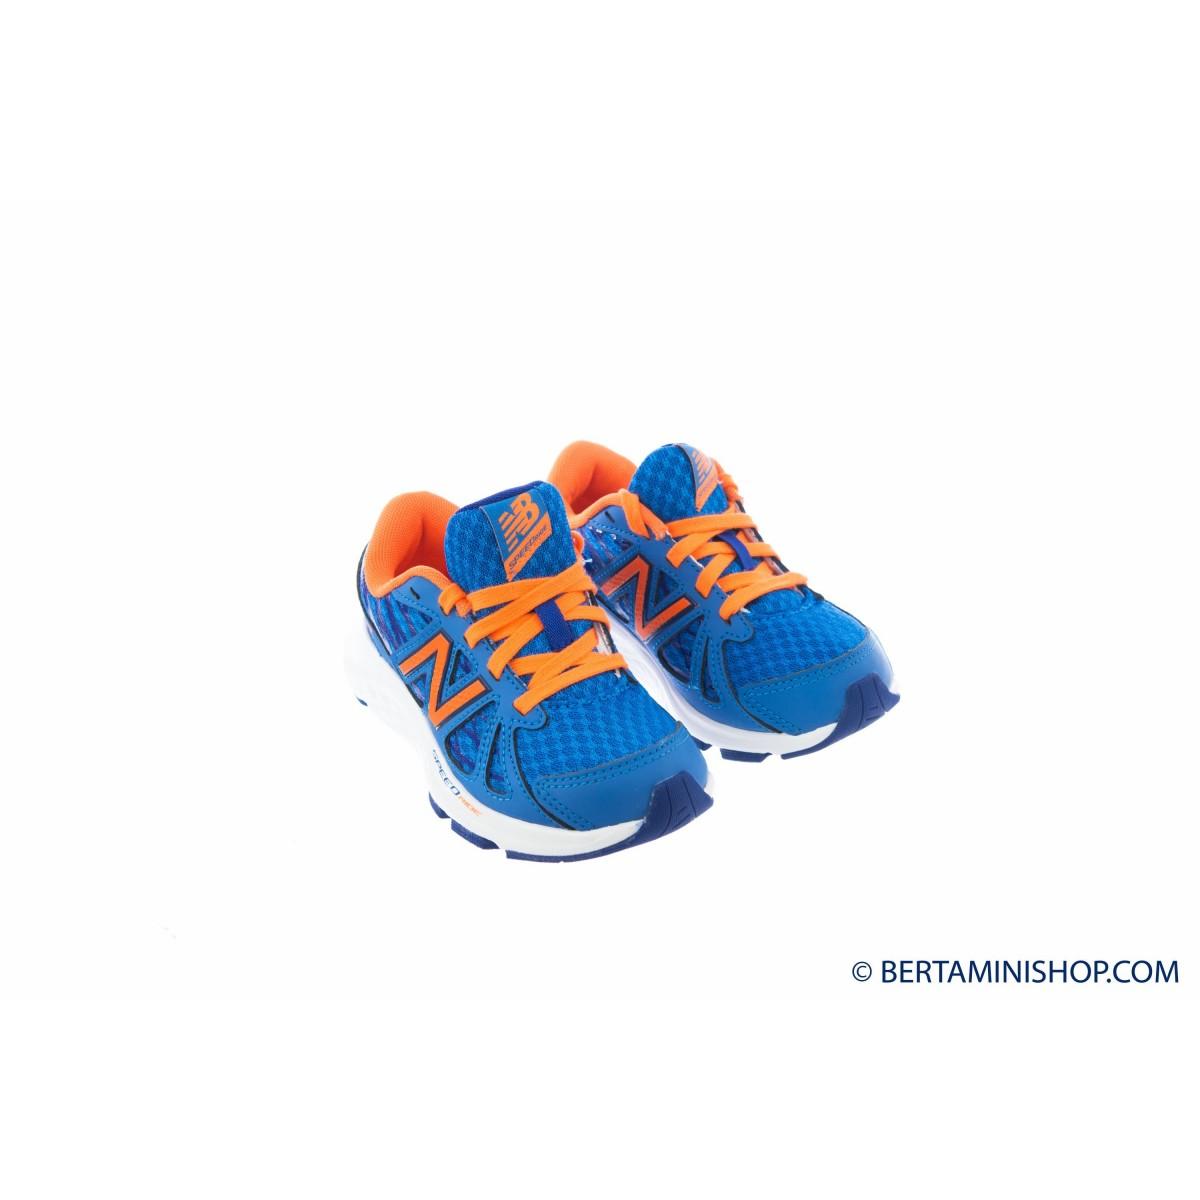 Scarpa New Balance Bambino - KJ690 Pre Scool PT - Bluette